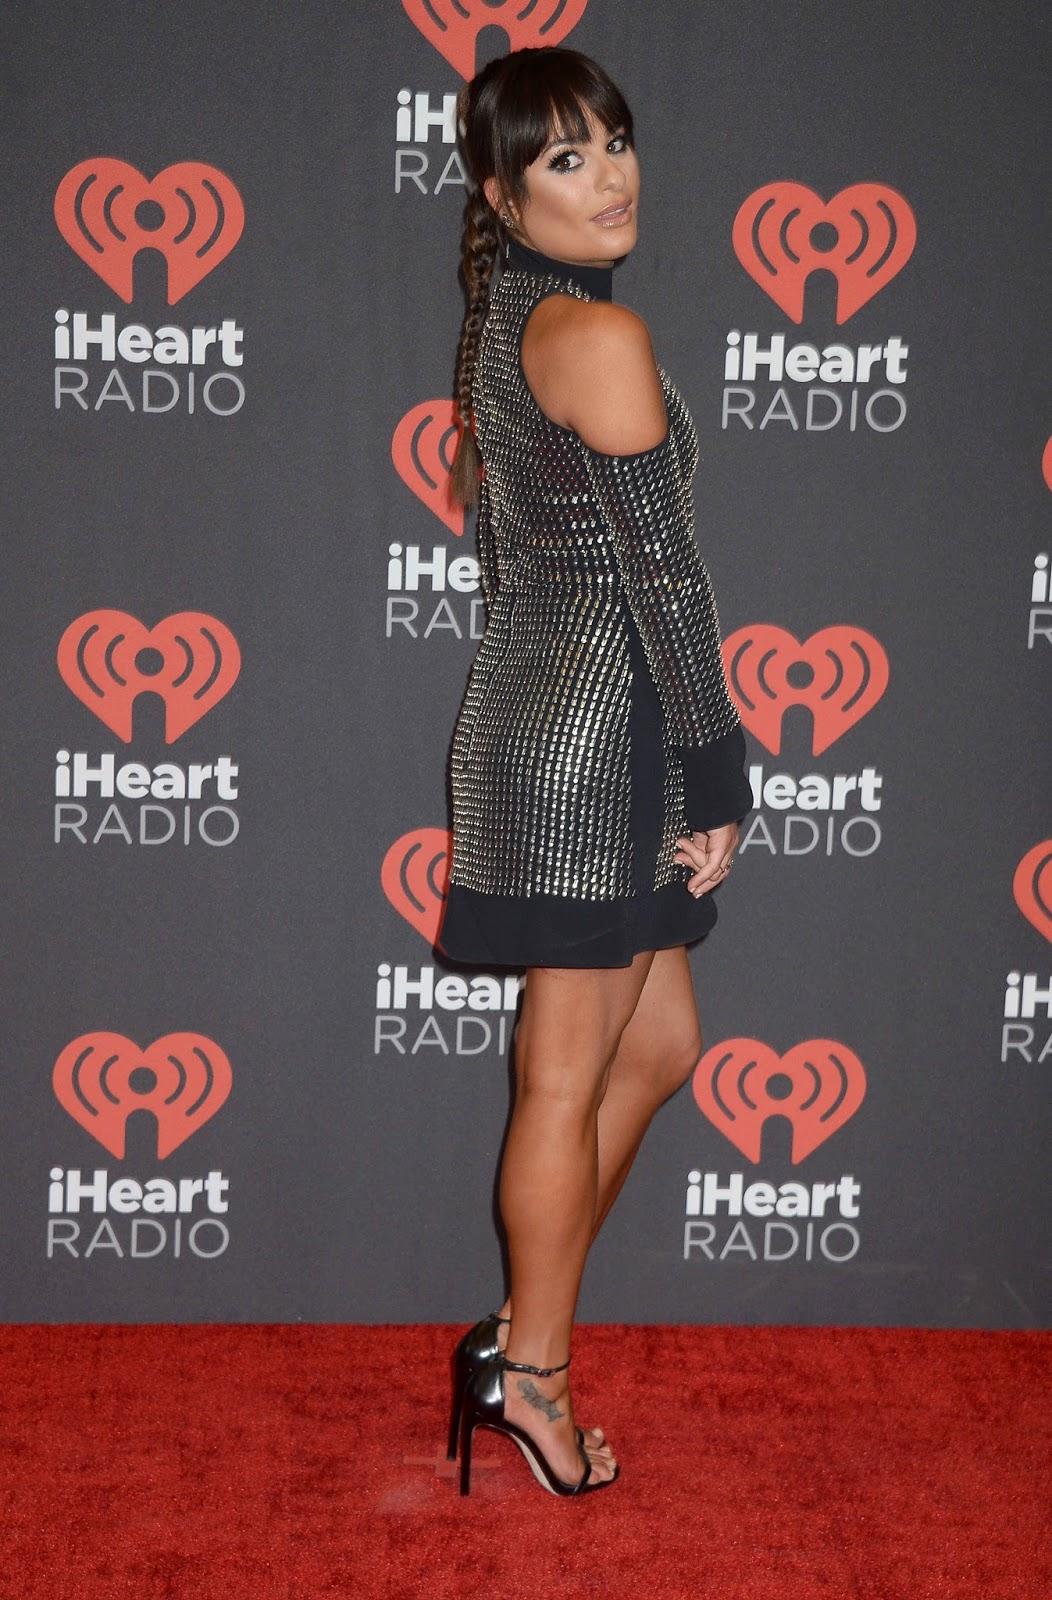 Lea Michele at 2016 IhearRradio Music Festival